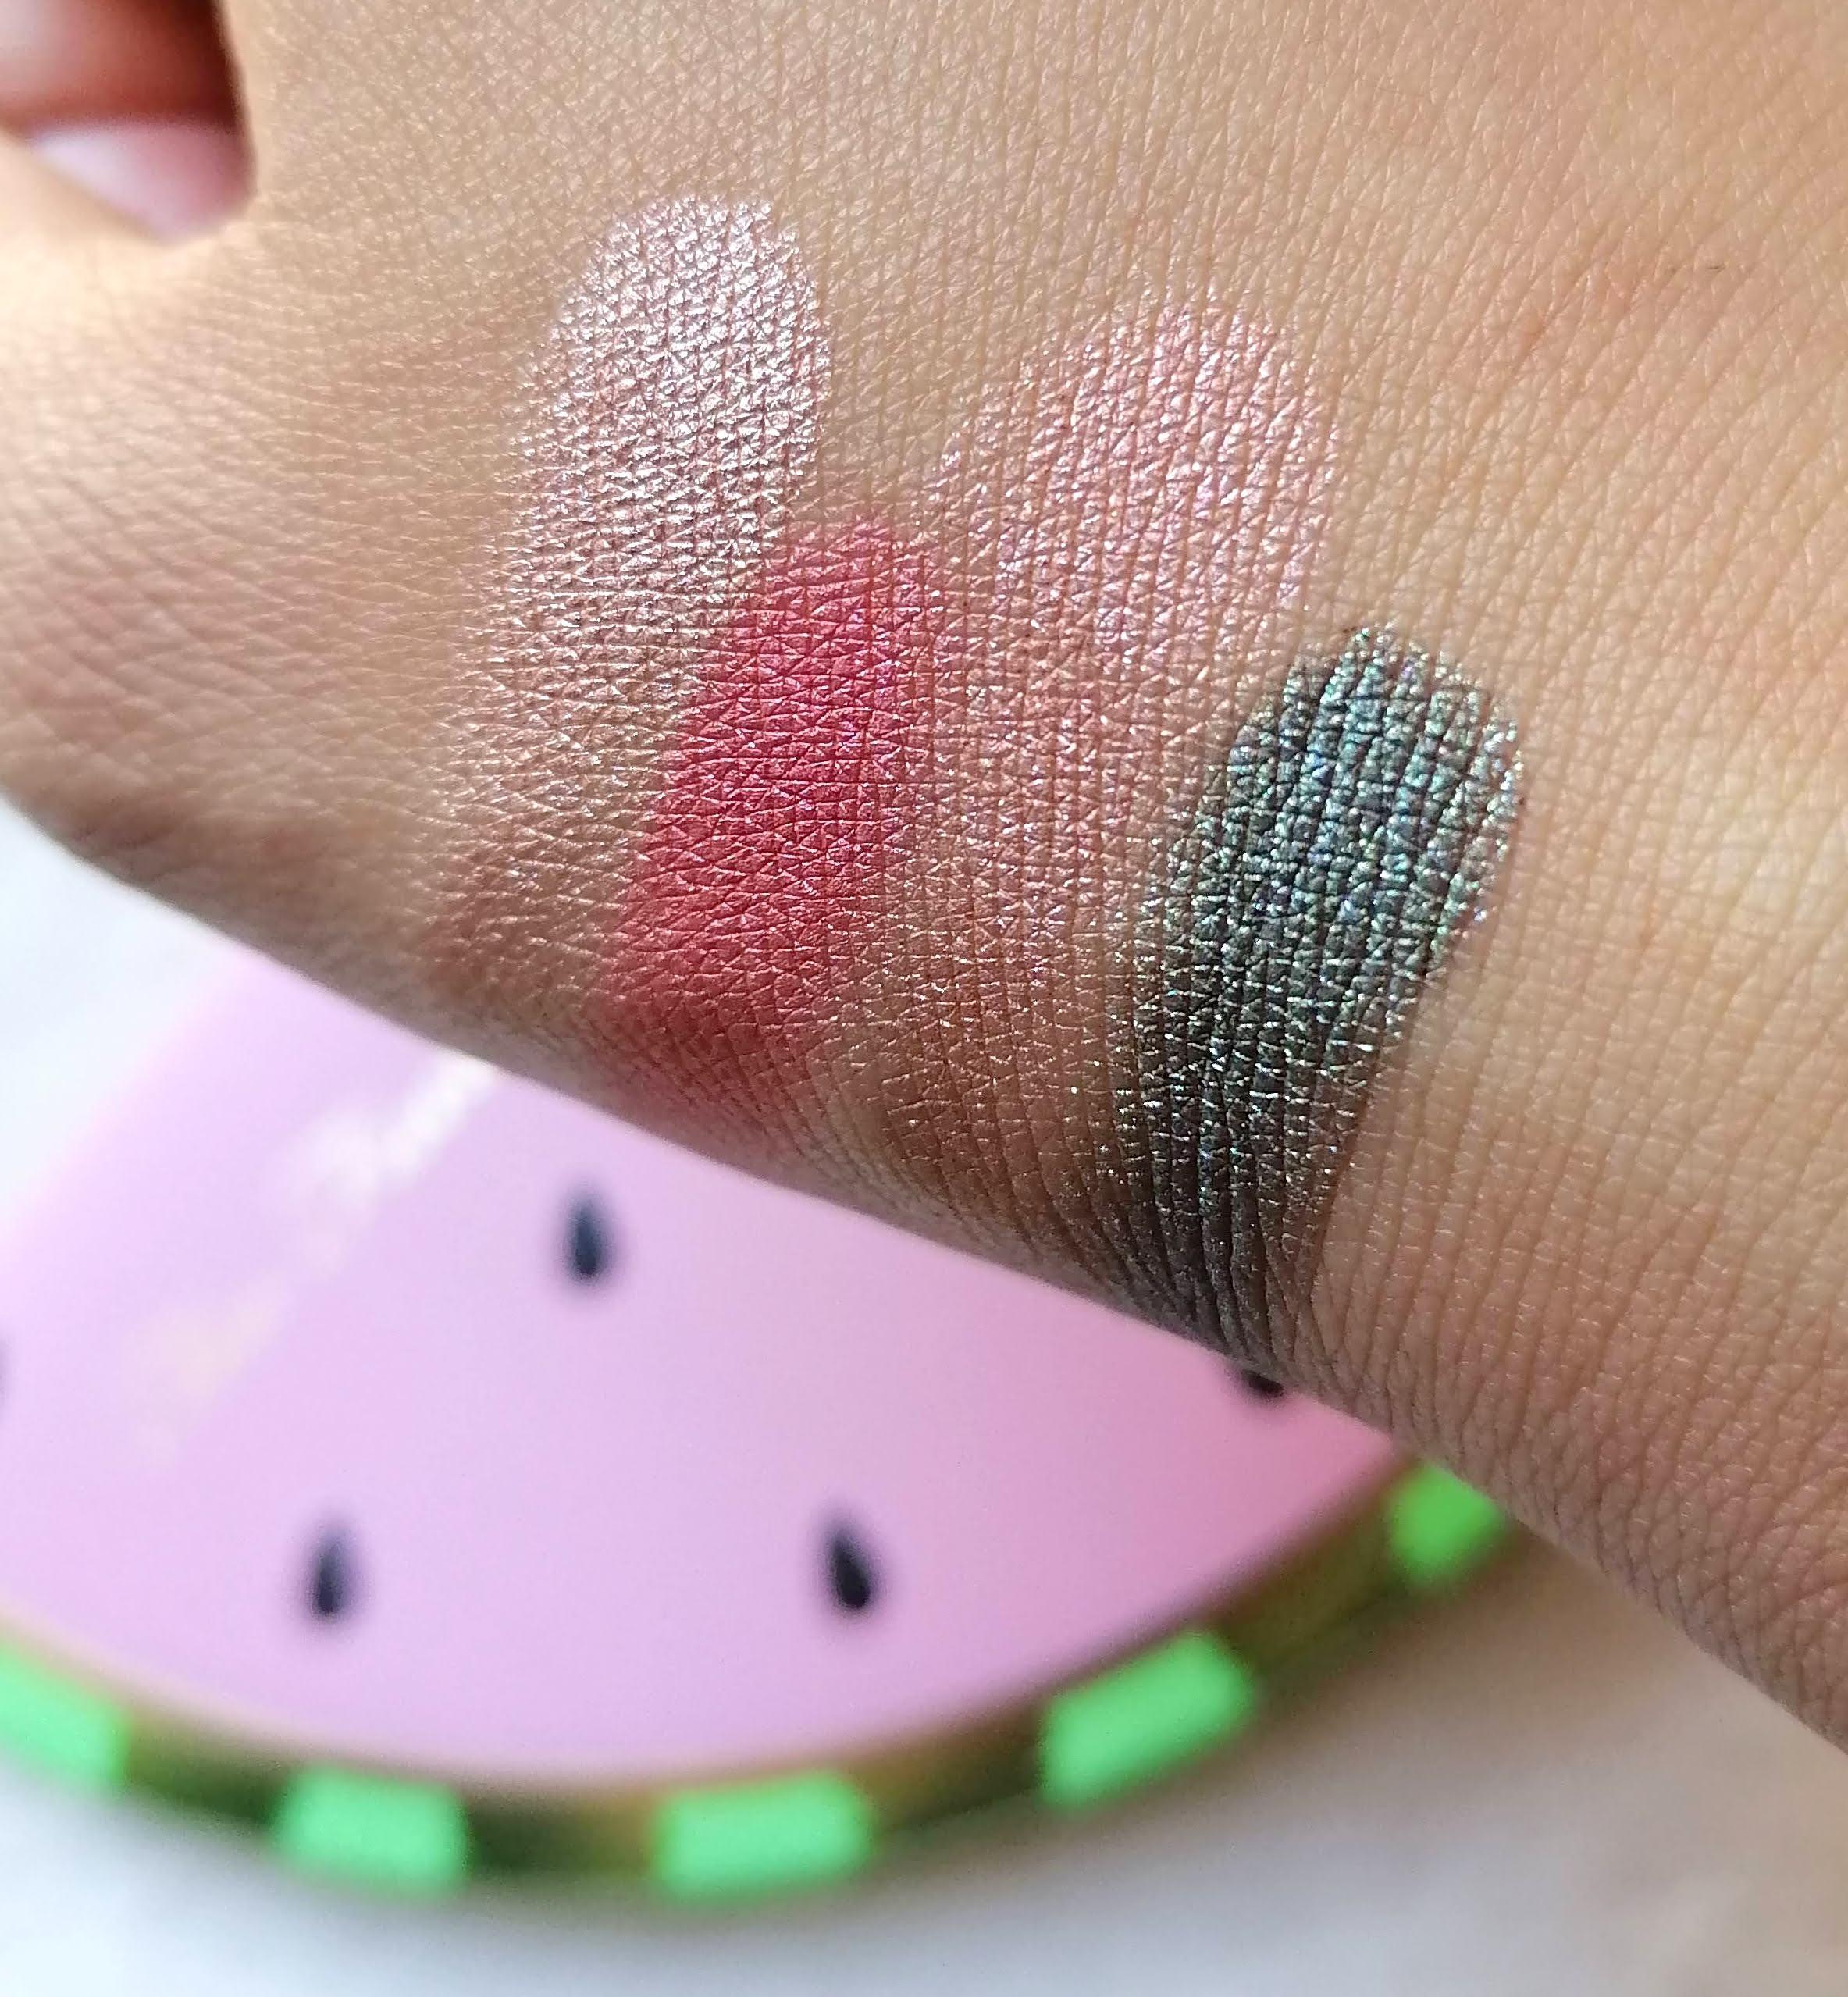 Watermelon Slice de TOO FACED - revue, swatch et make up 🍉